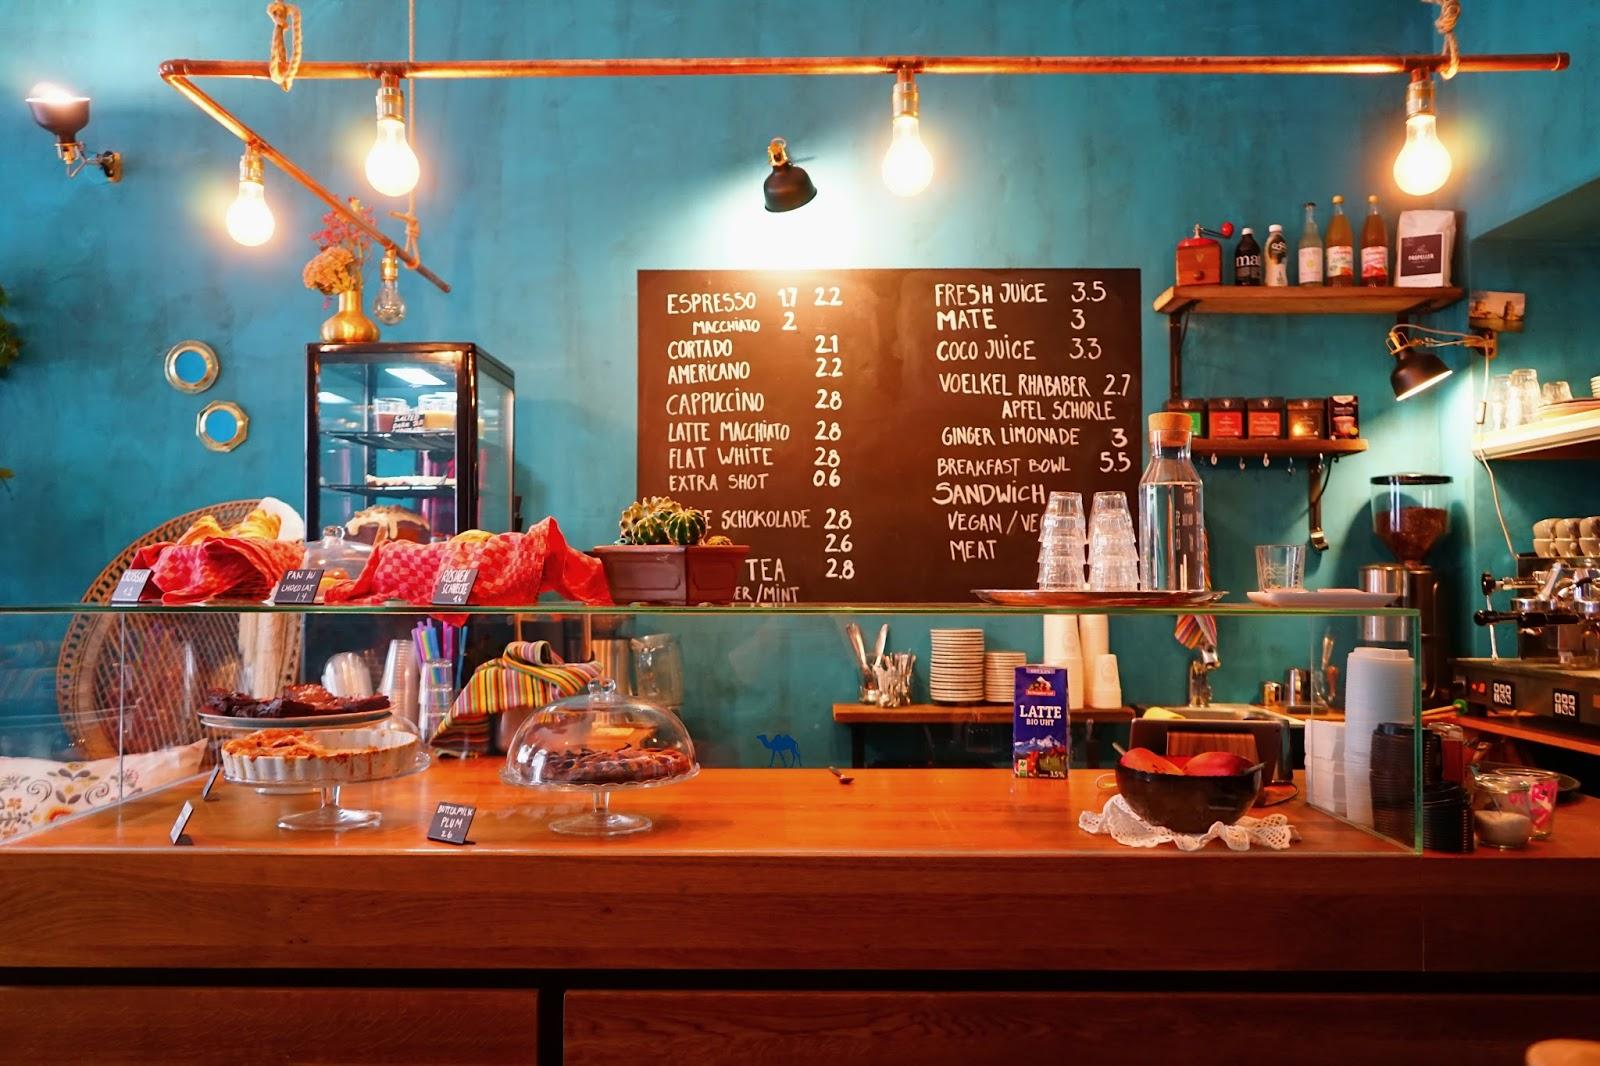 Le Chameau Bleu -  Comptoir Frida Cafe